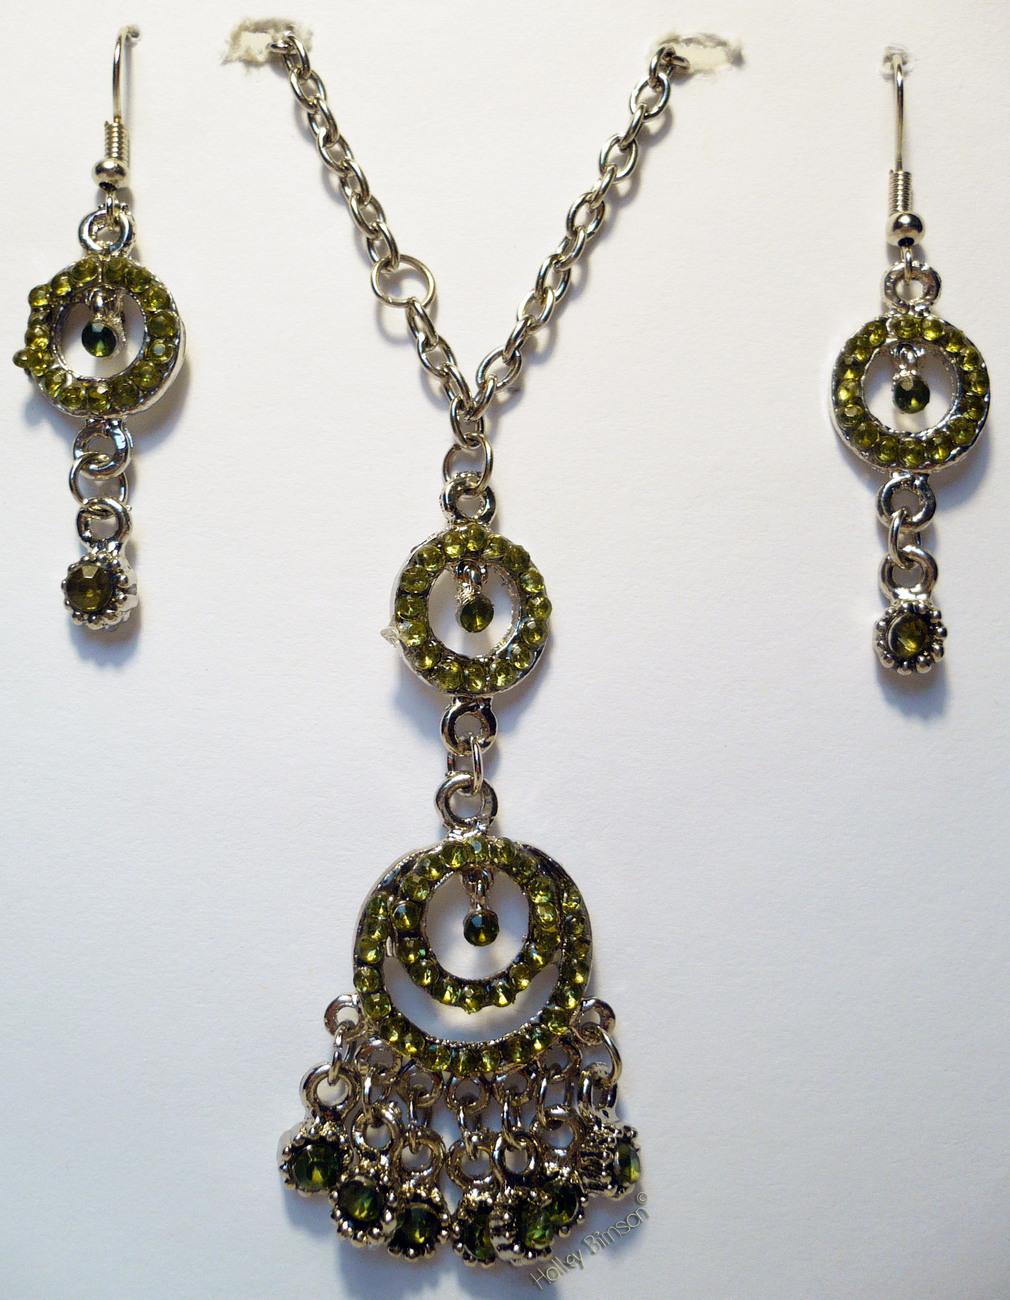 Rhinestone Necklace/Earring Combo # 5 Buyers Choice Bonanza